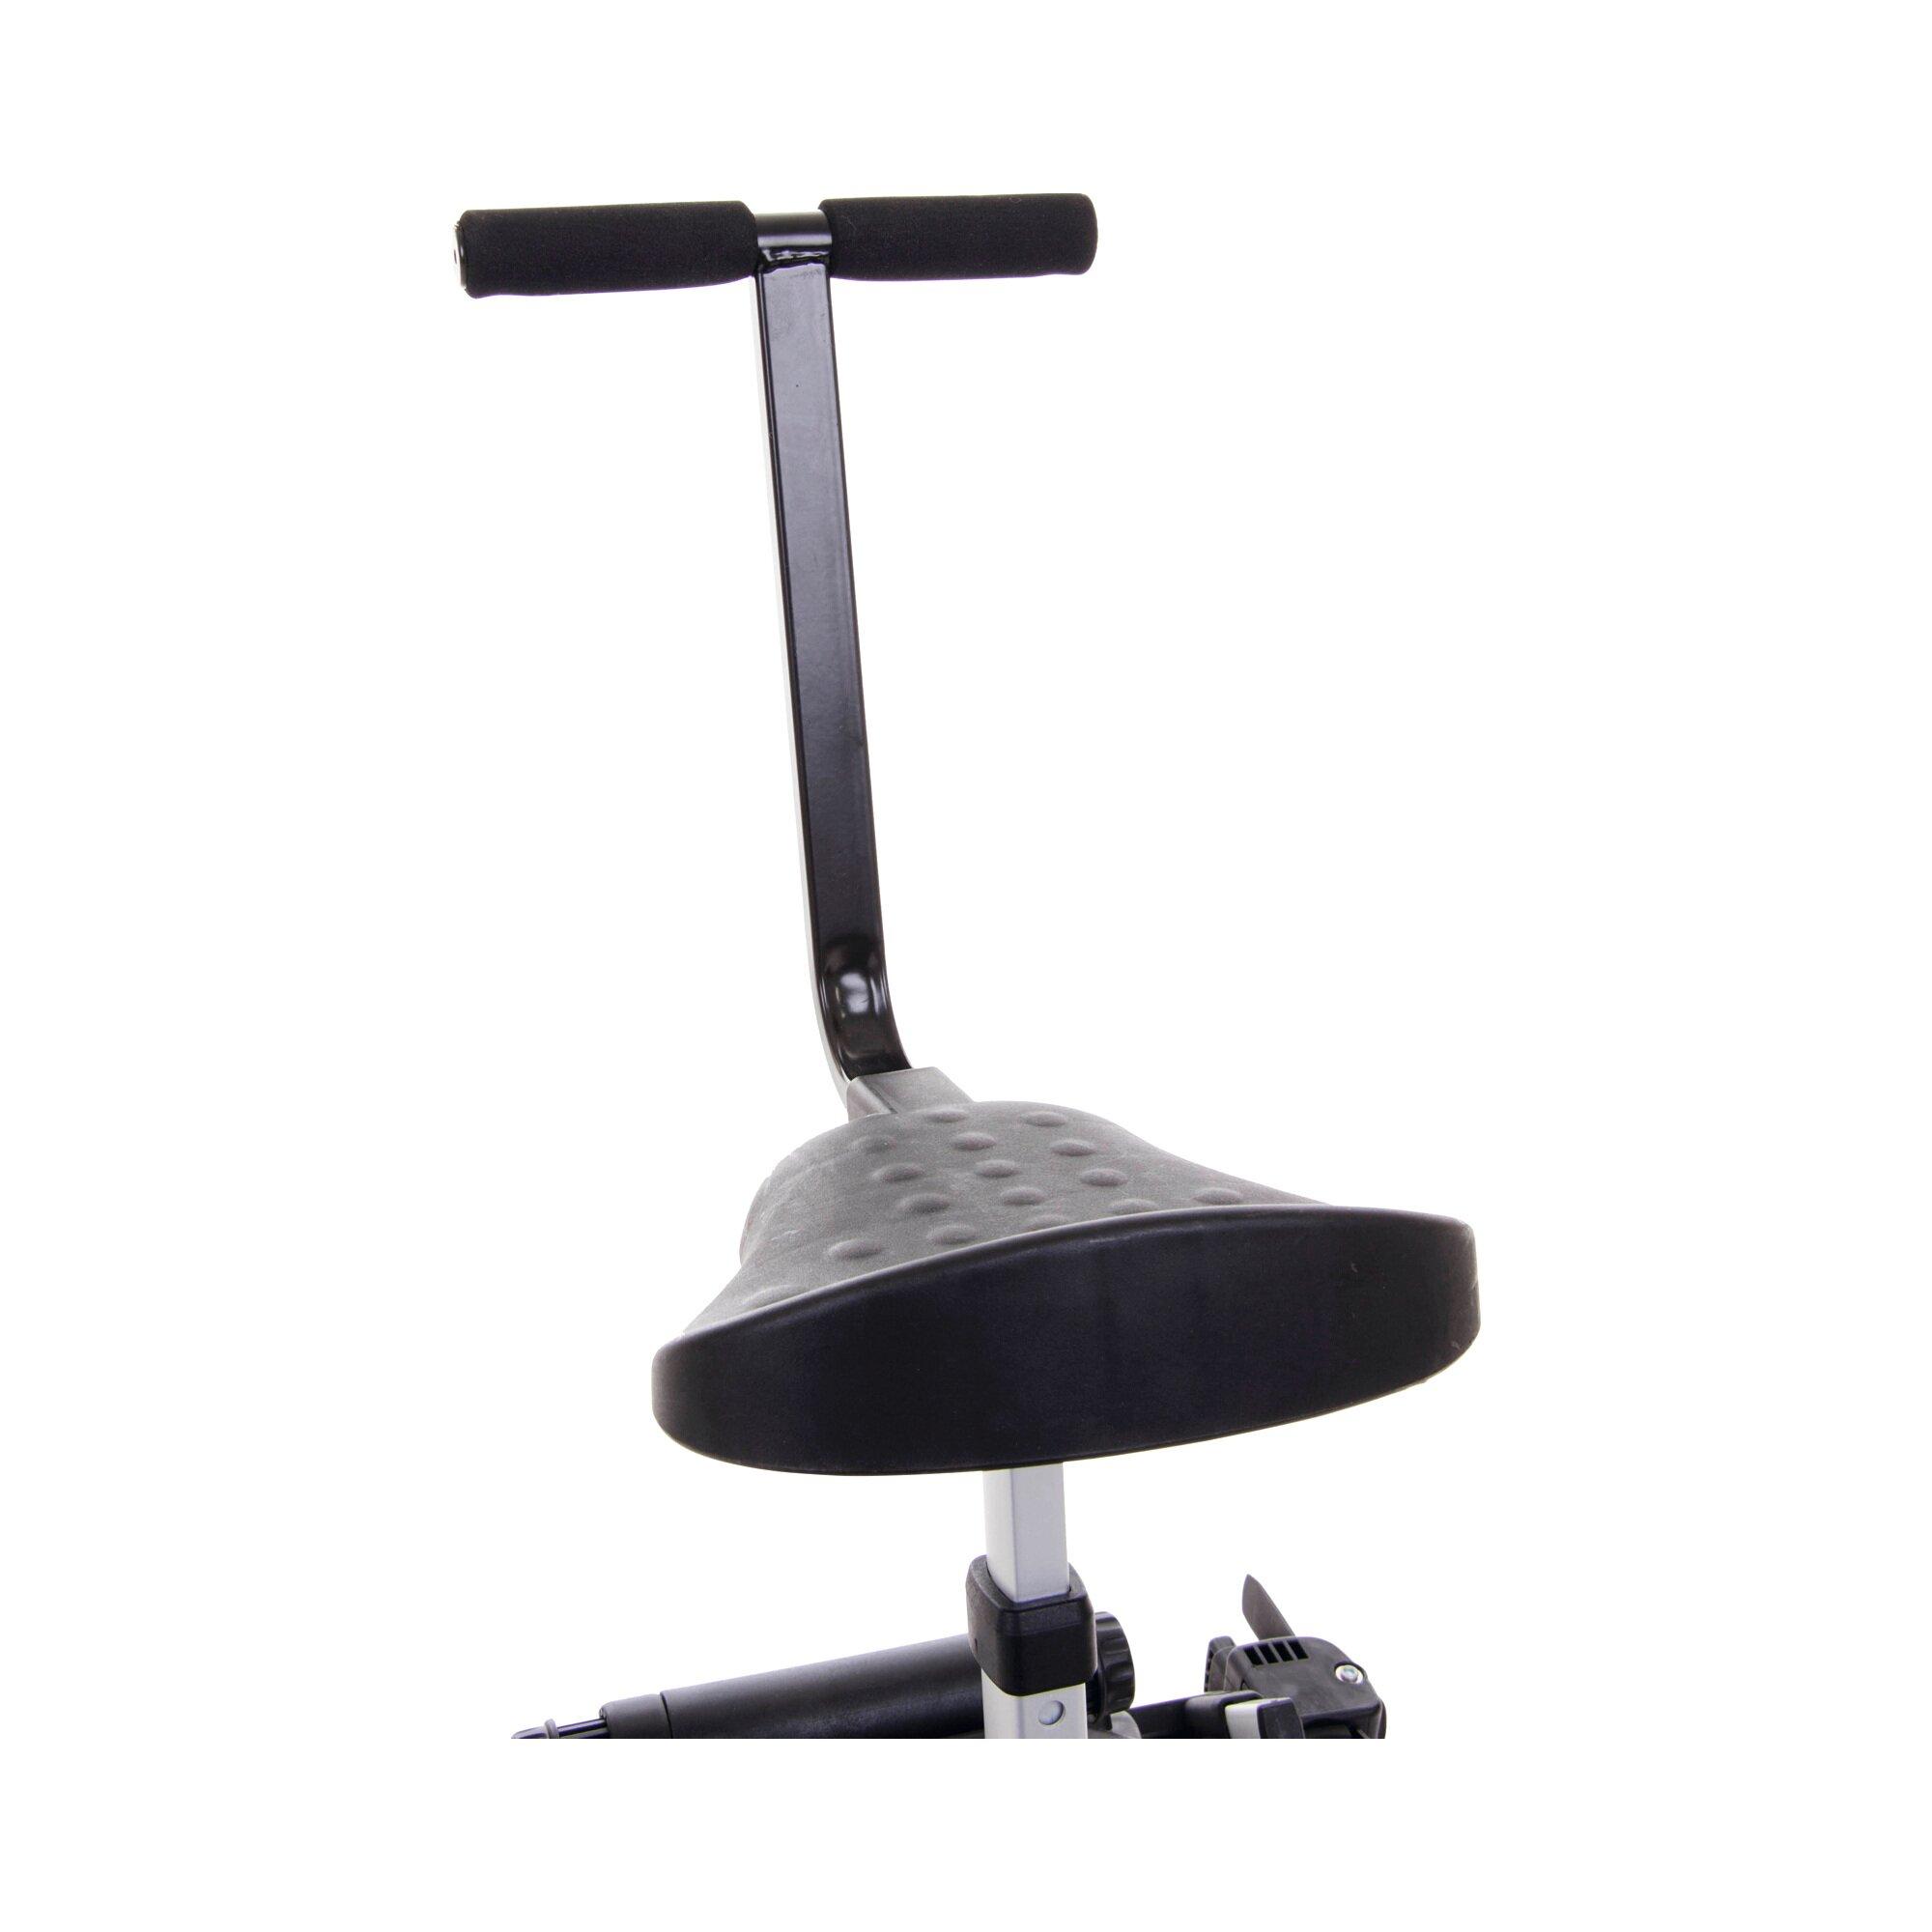 fillikid-zusatzsitz-fur-buggy-board-filliboard-fur-kinderwagen-schwarz